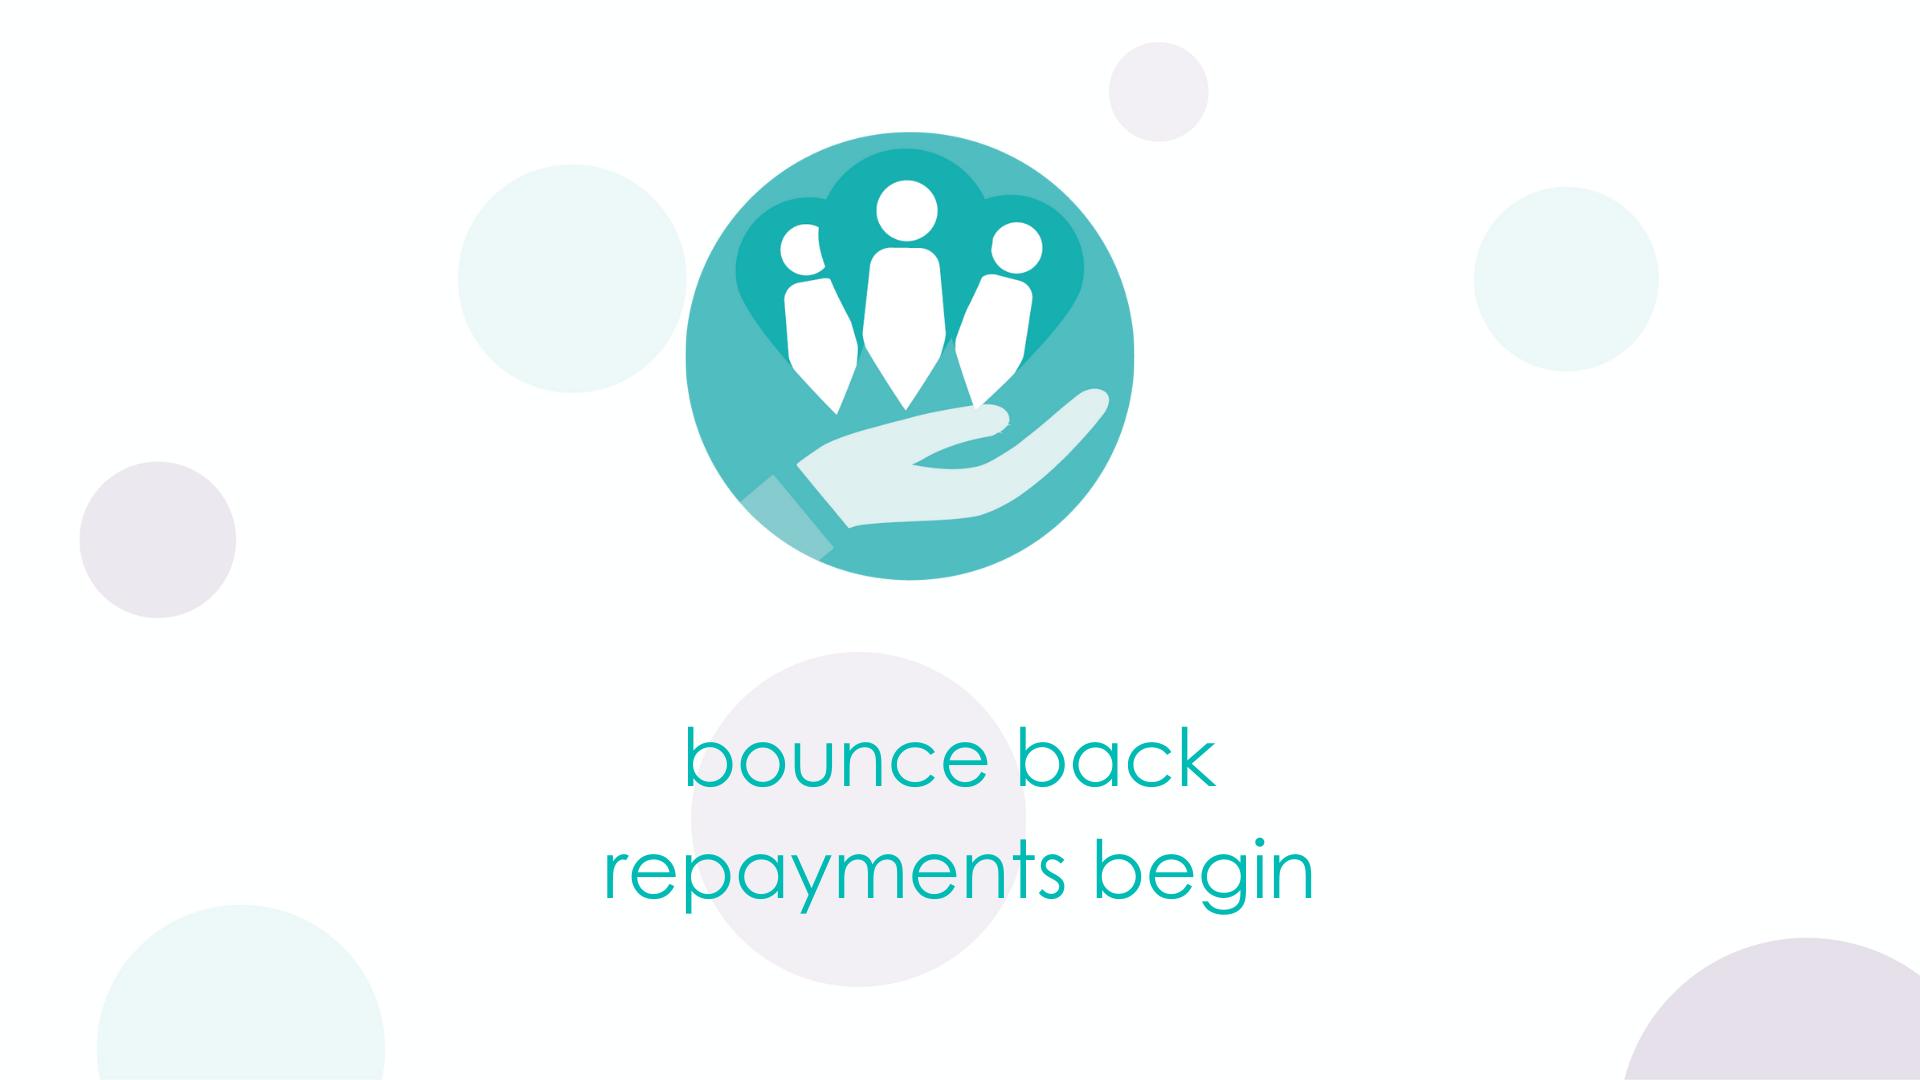 bounce back repayments begin